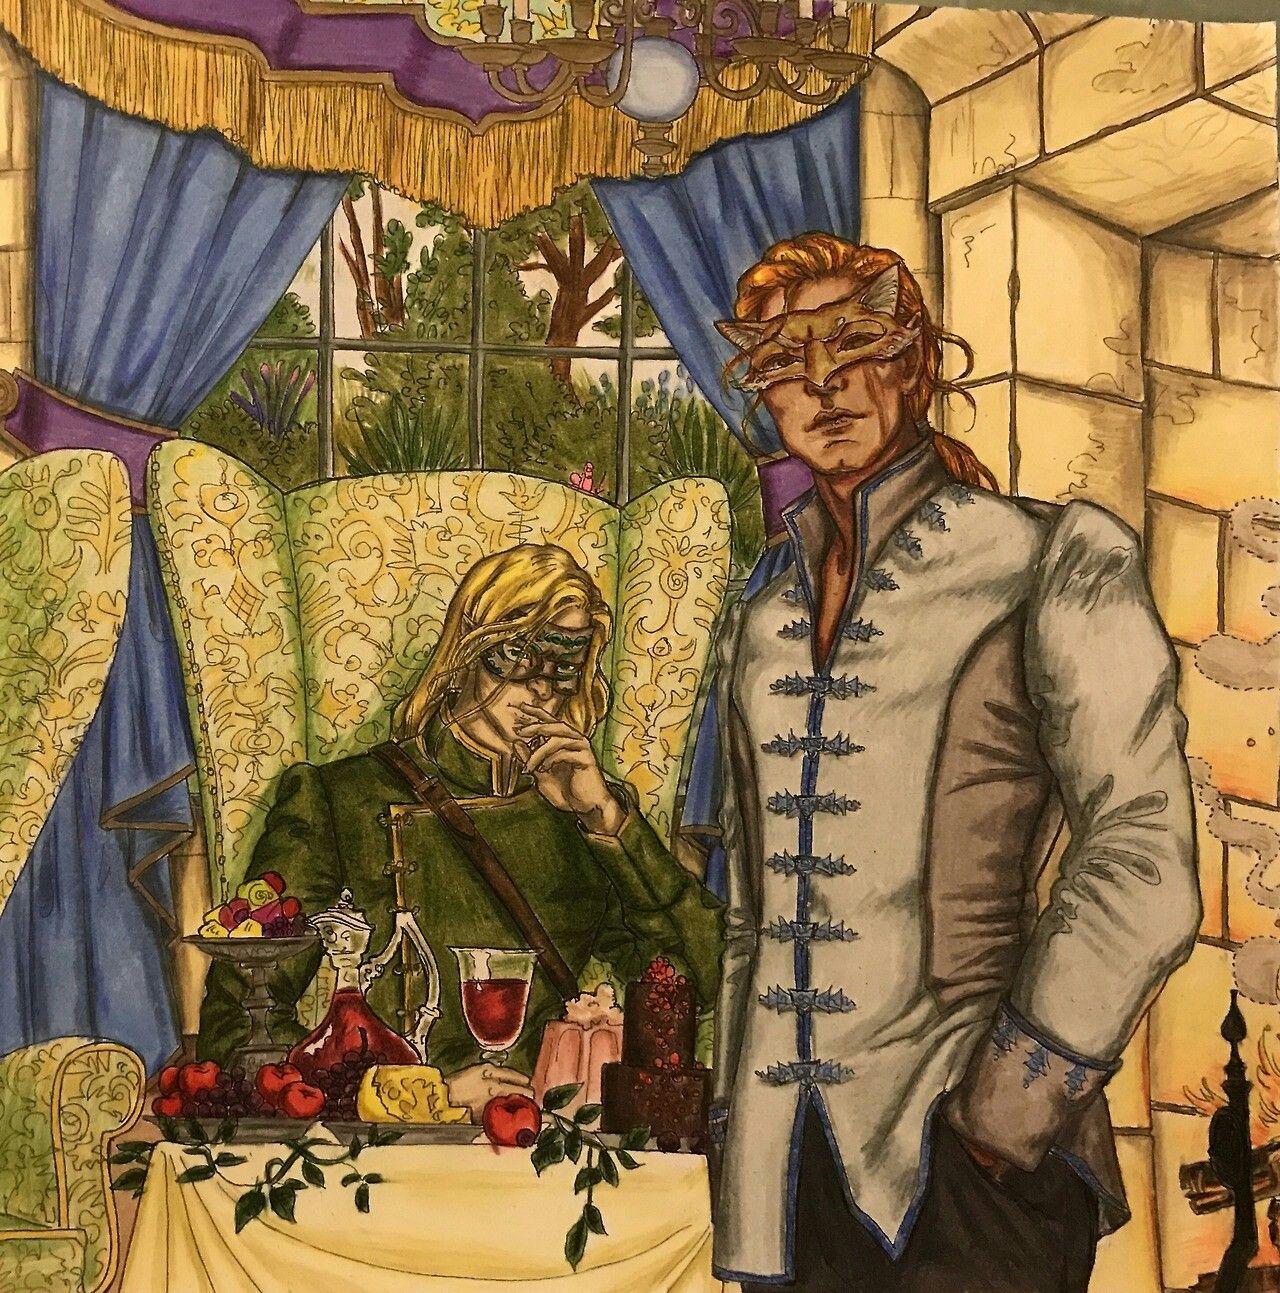 Lucien Tamlin Fan Art Rosas Serie De Livros Trono De Vidro